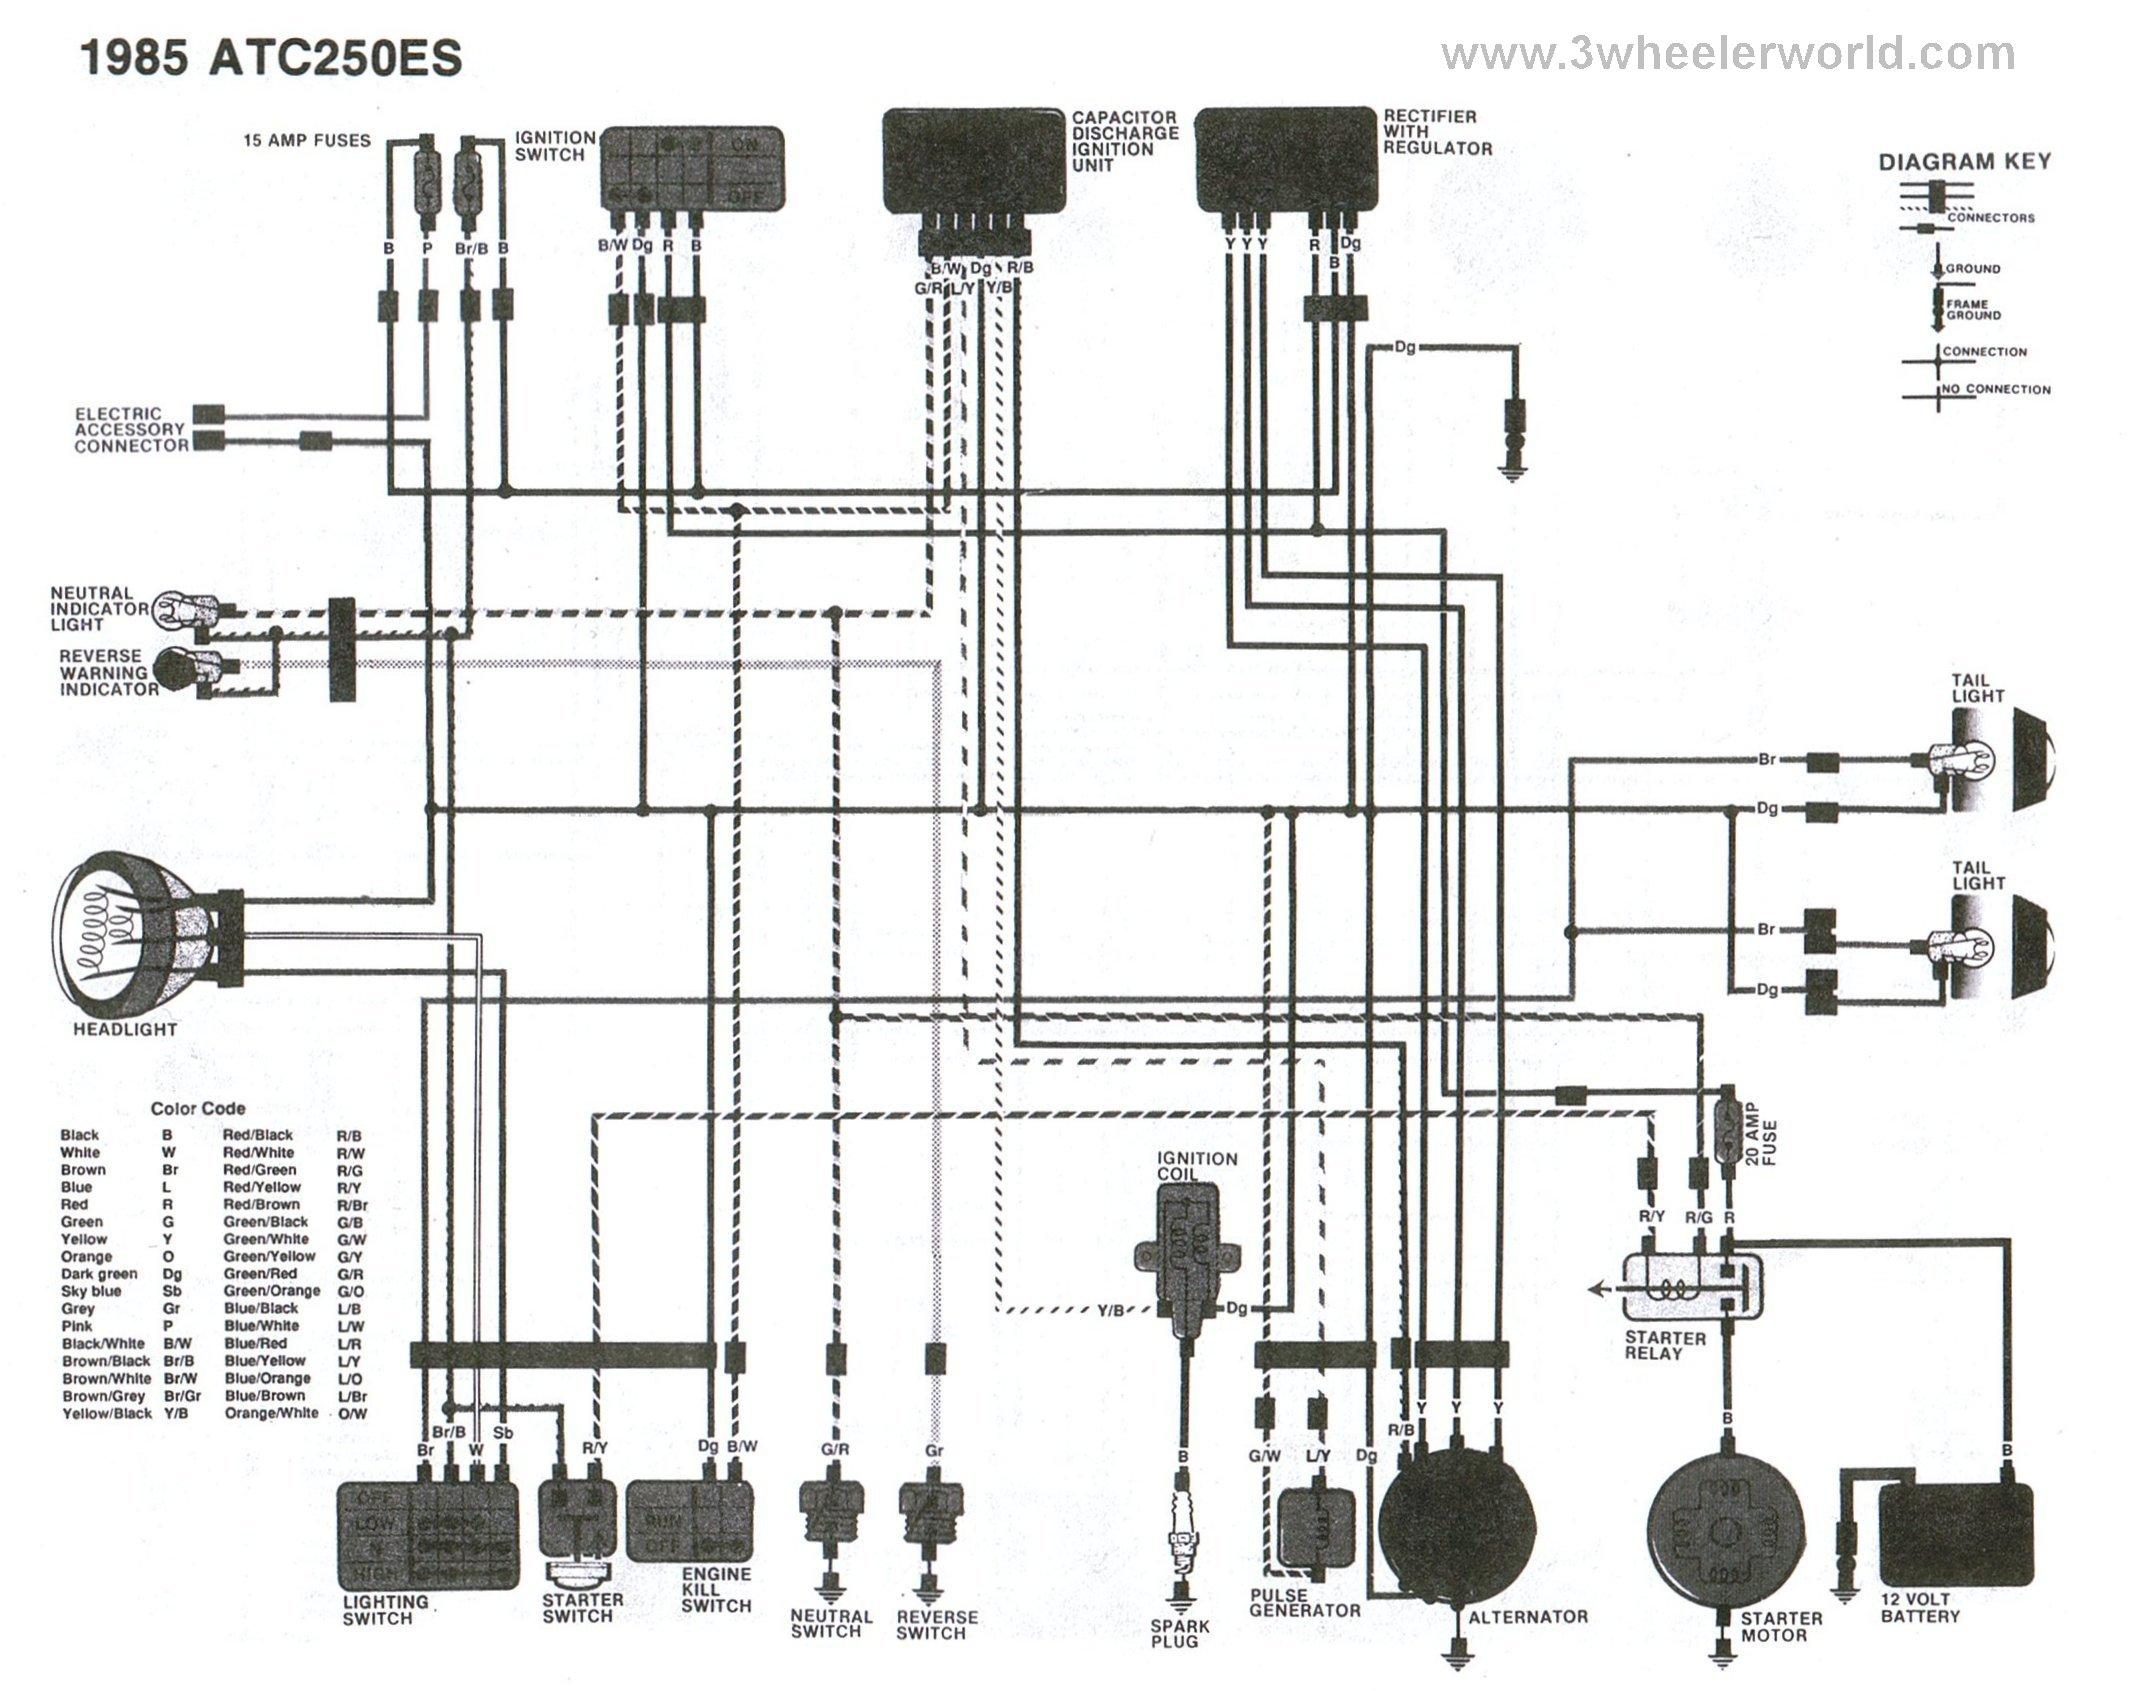 Honda 250Ex Wiring Diagram from i1.wp.com